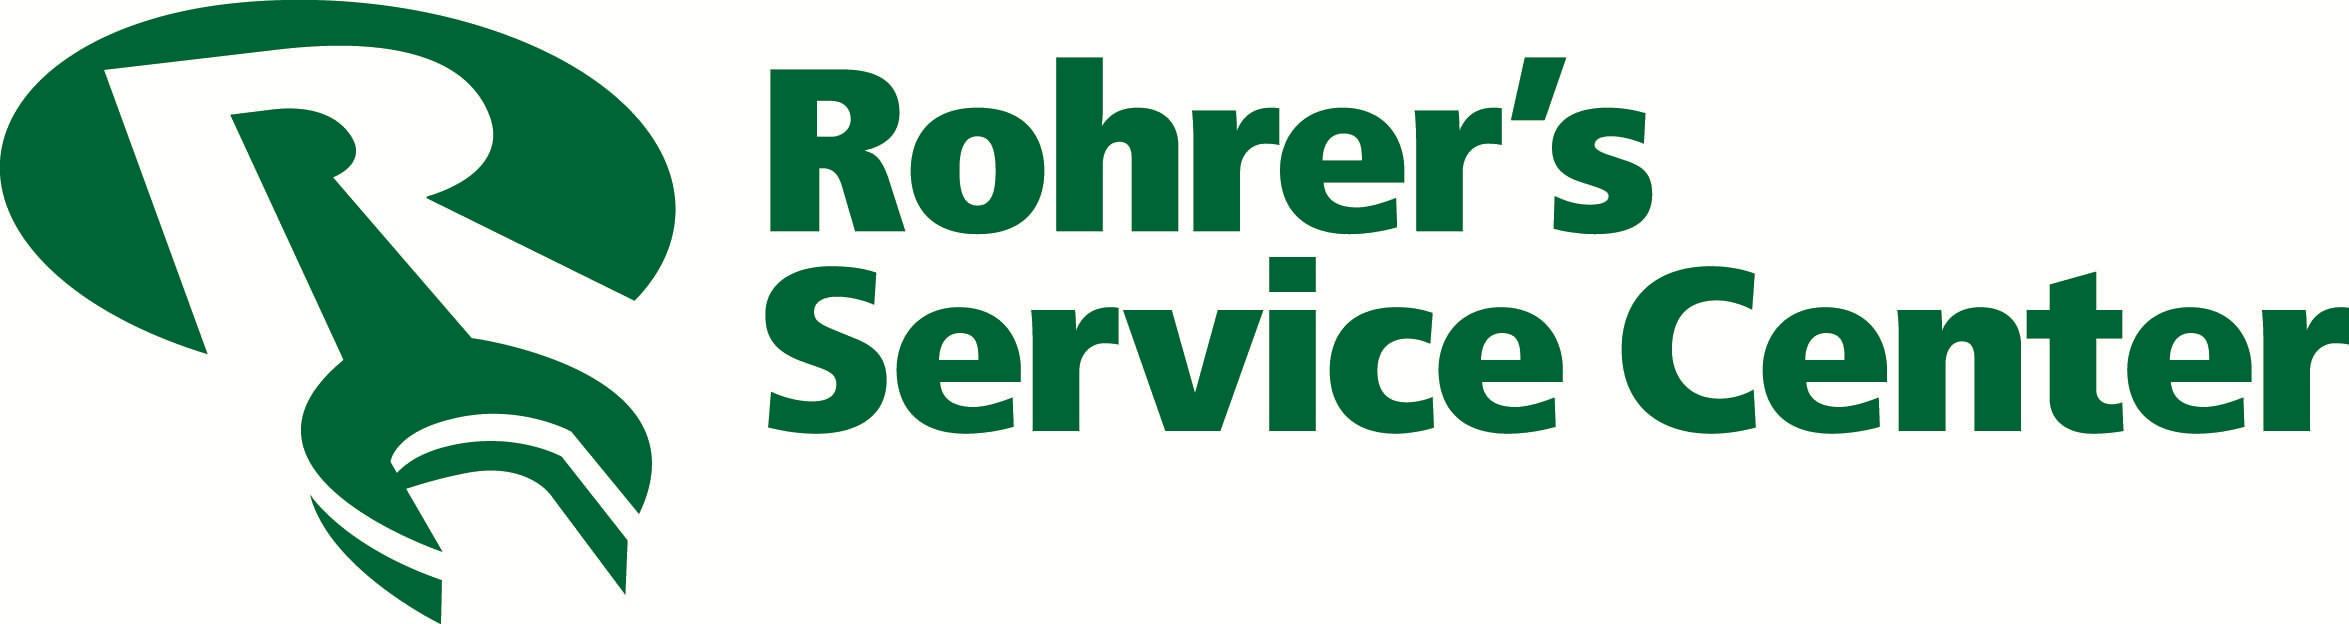 Rohrer's Service Center